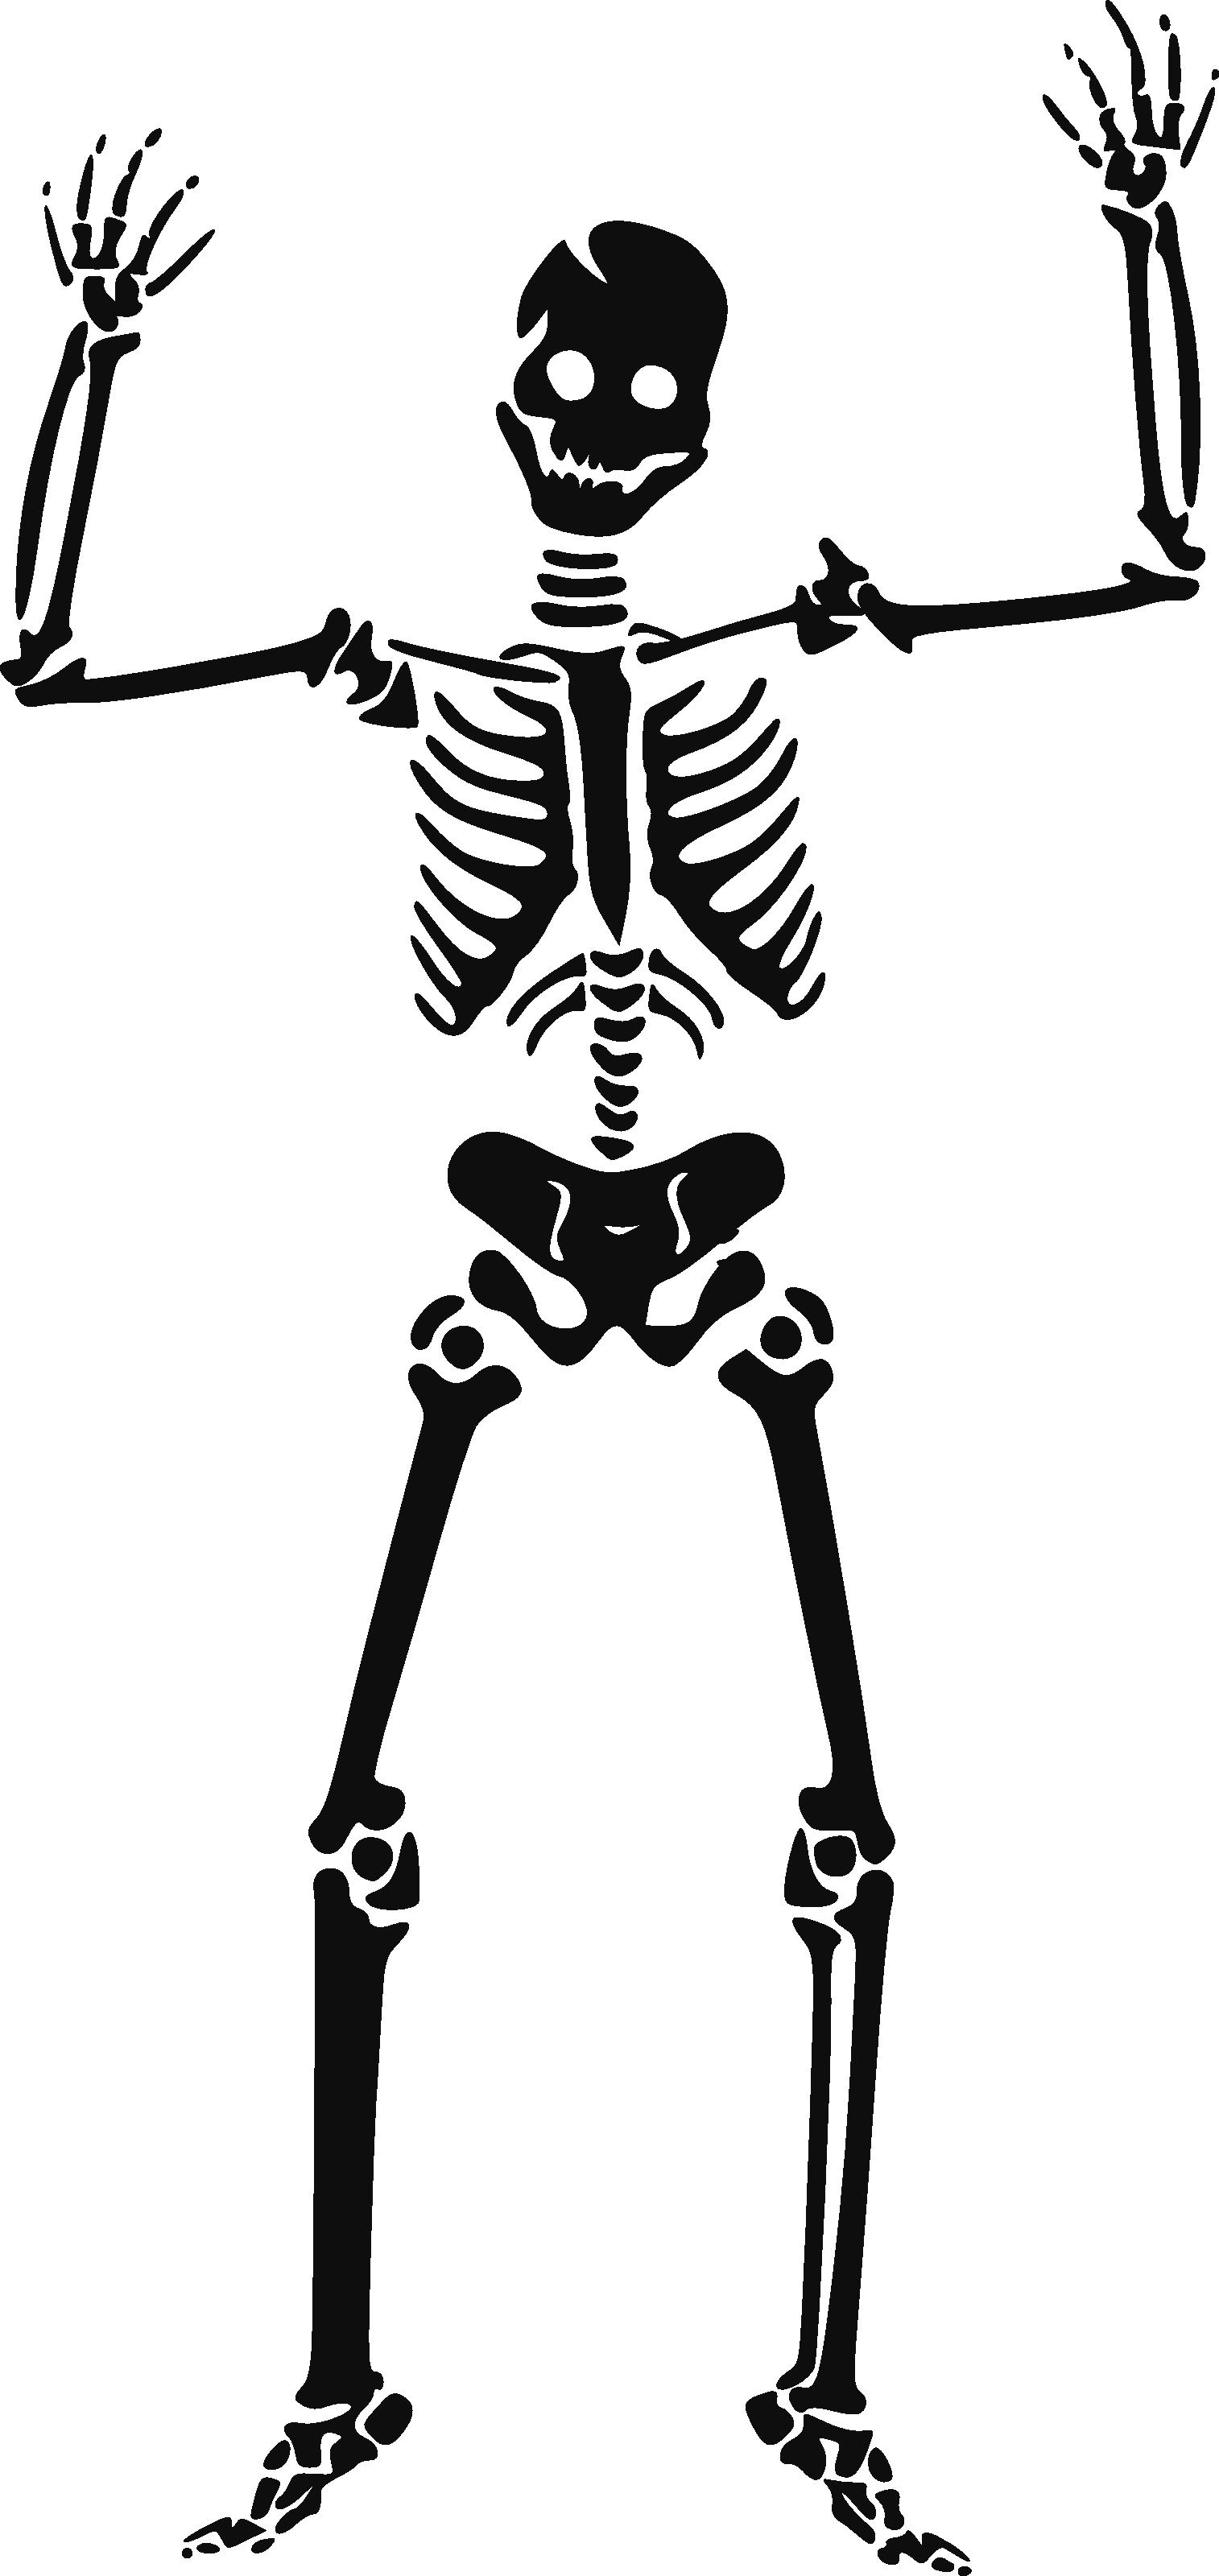 Skeleton siluet PNG image